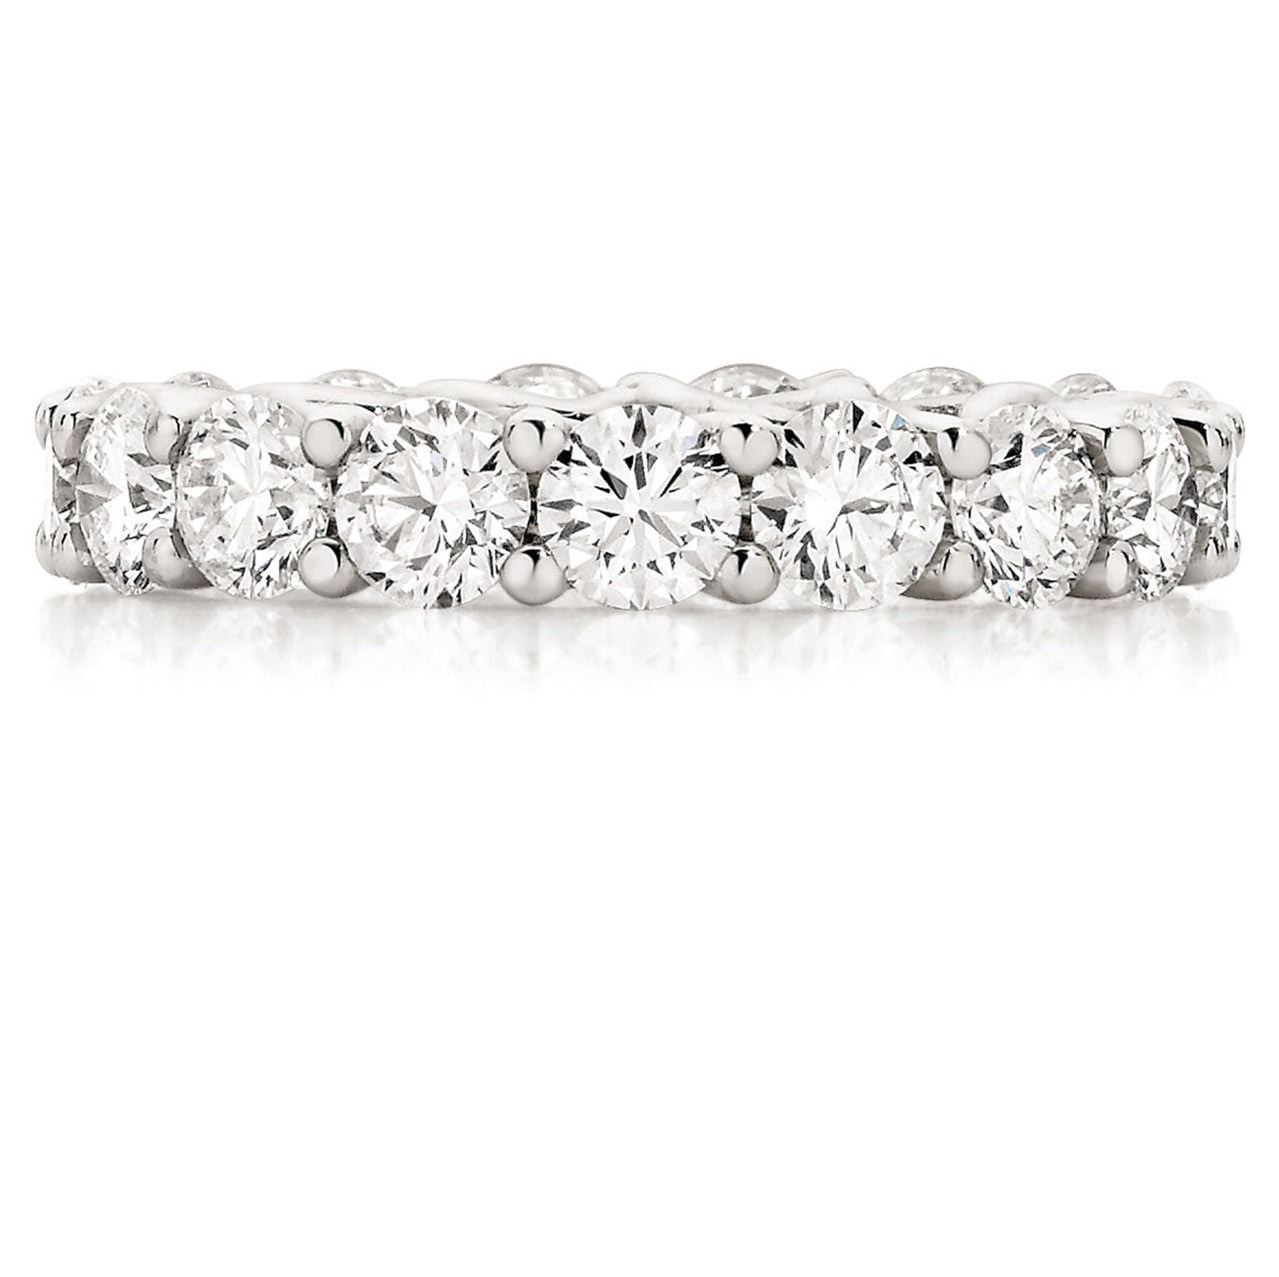 Microclaw Diamonds Bands